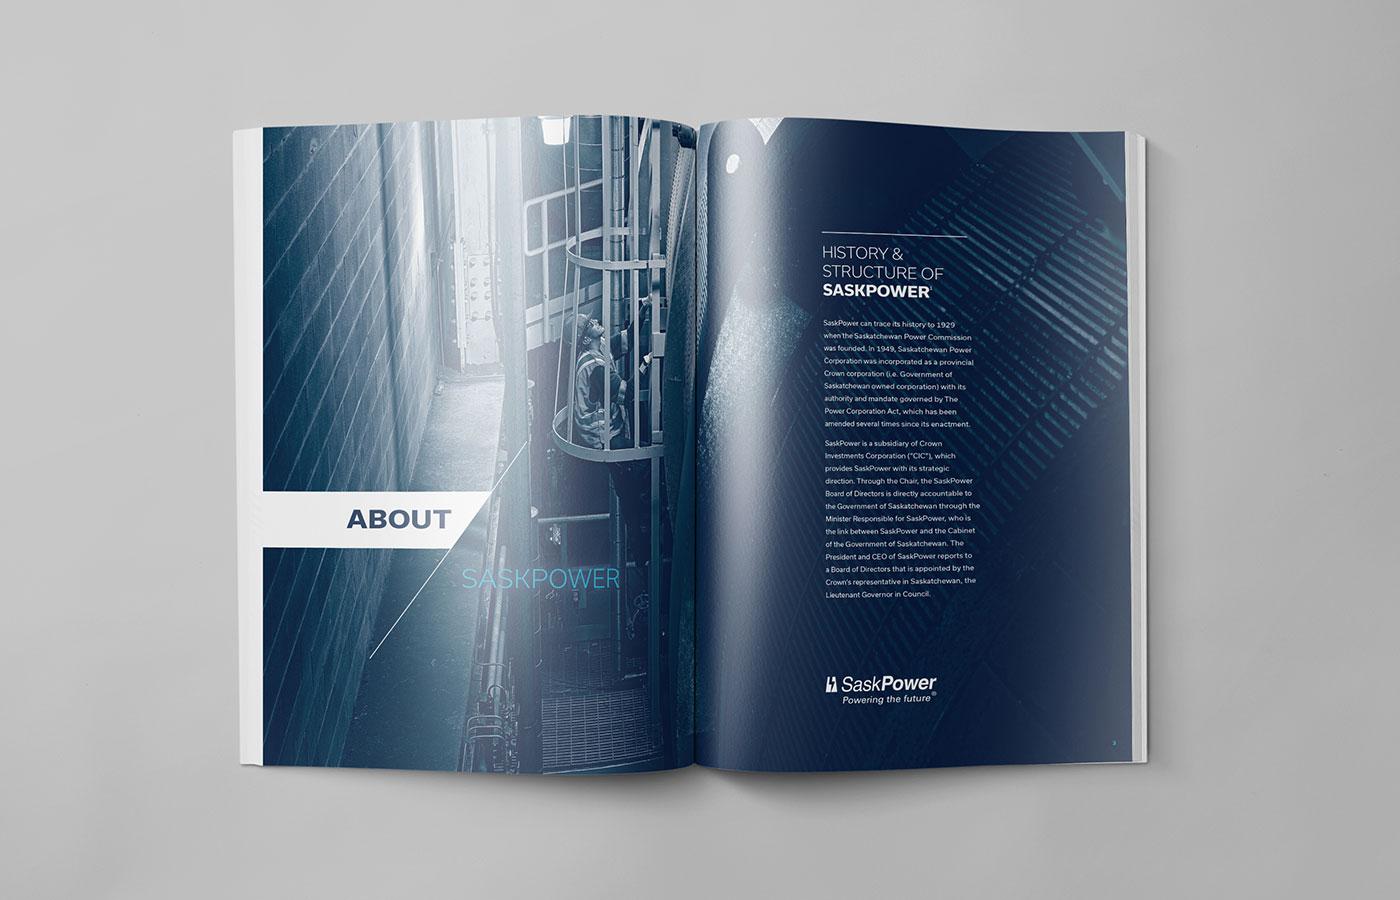 covetdesign_logo-design_branding_brochure-design_graphic-designer_vancouver_print_saskpower4